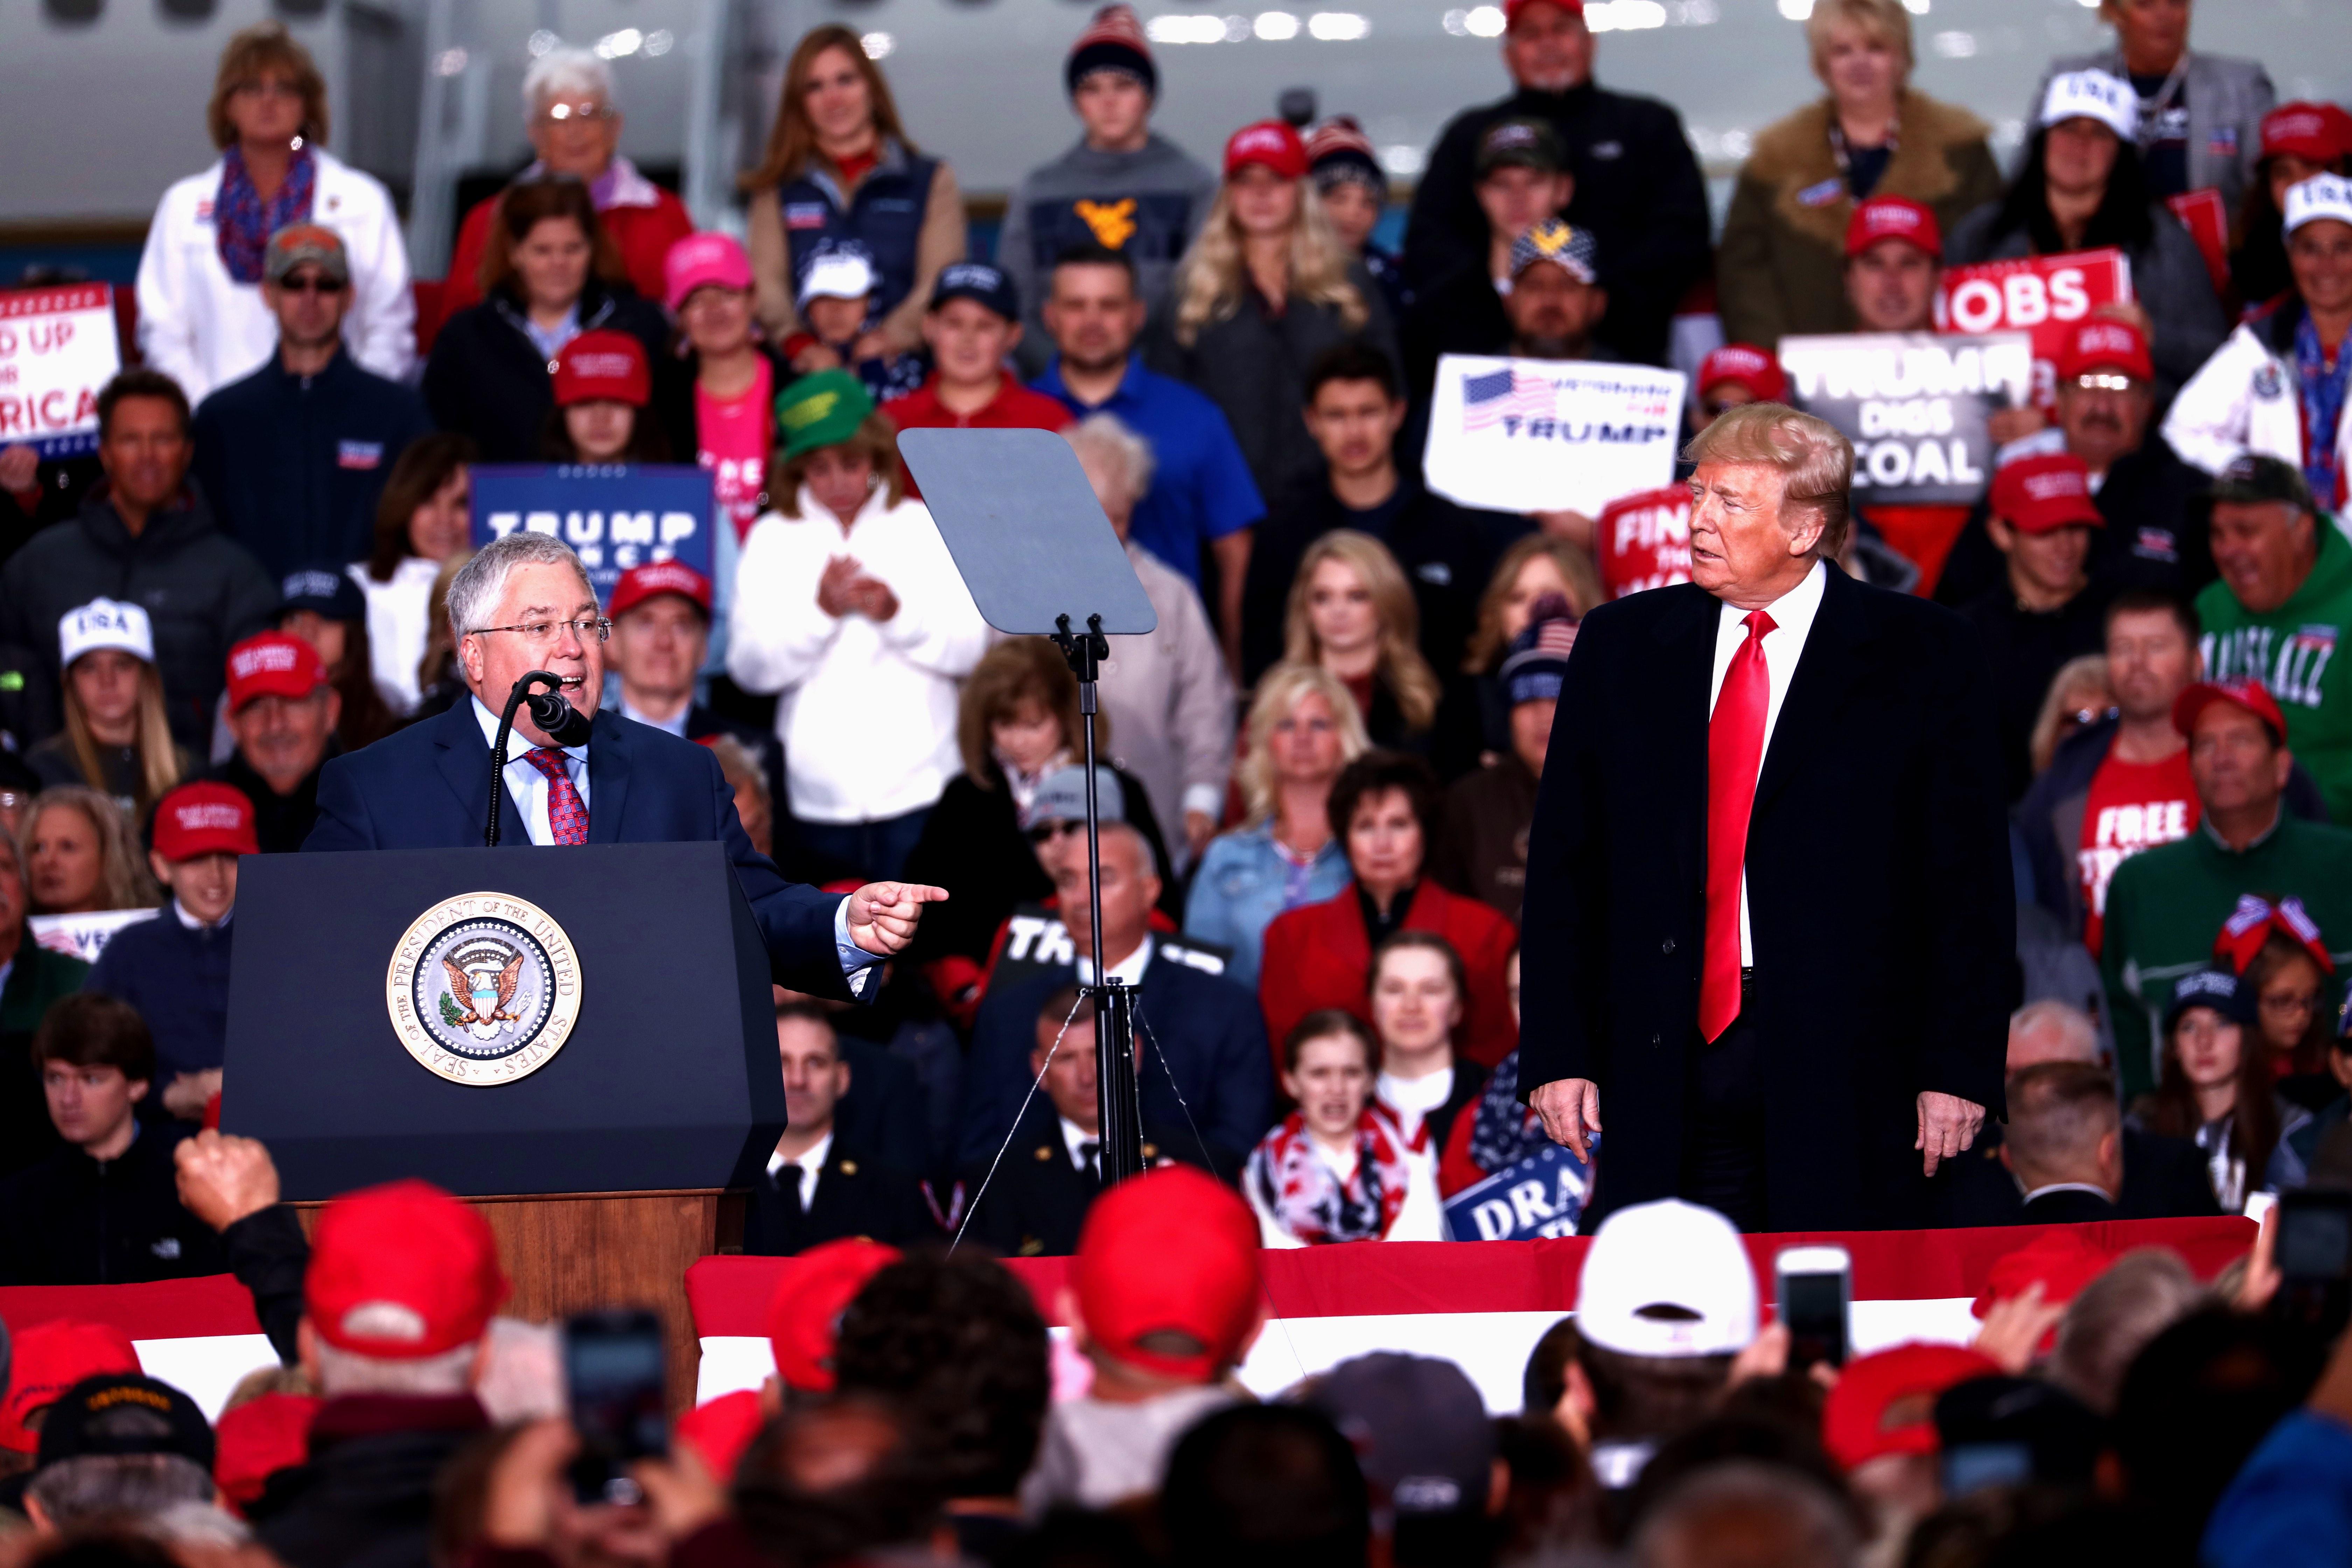 GOP Senate candidate Patrick Morrisey and President Donald Trump